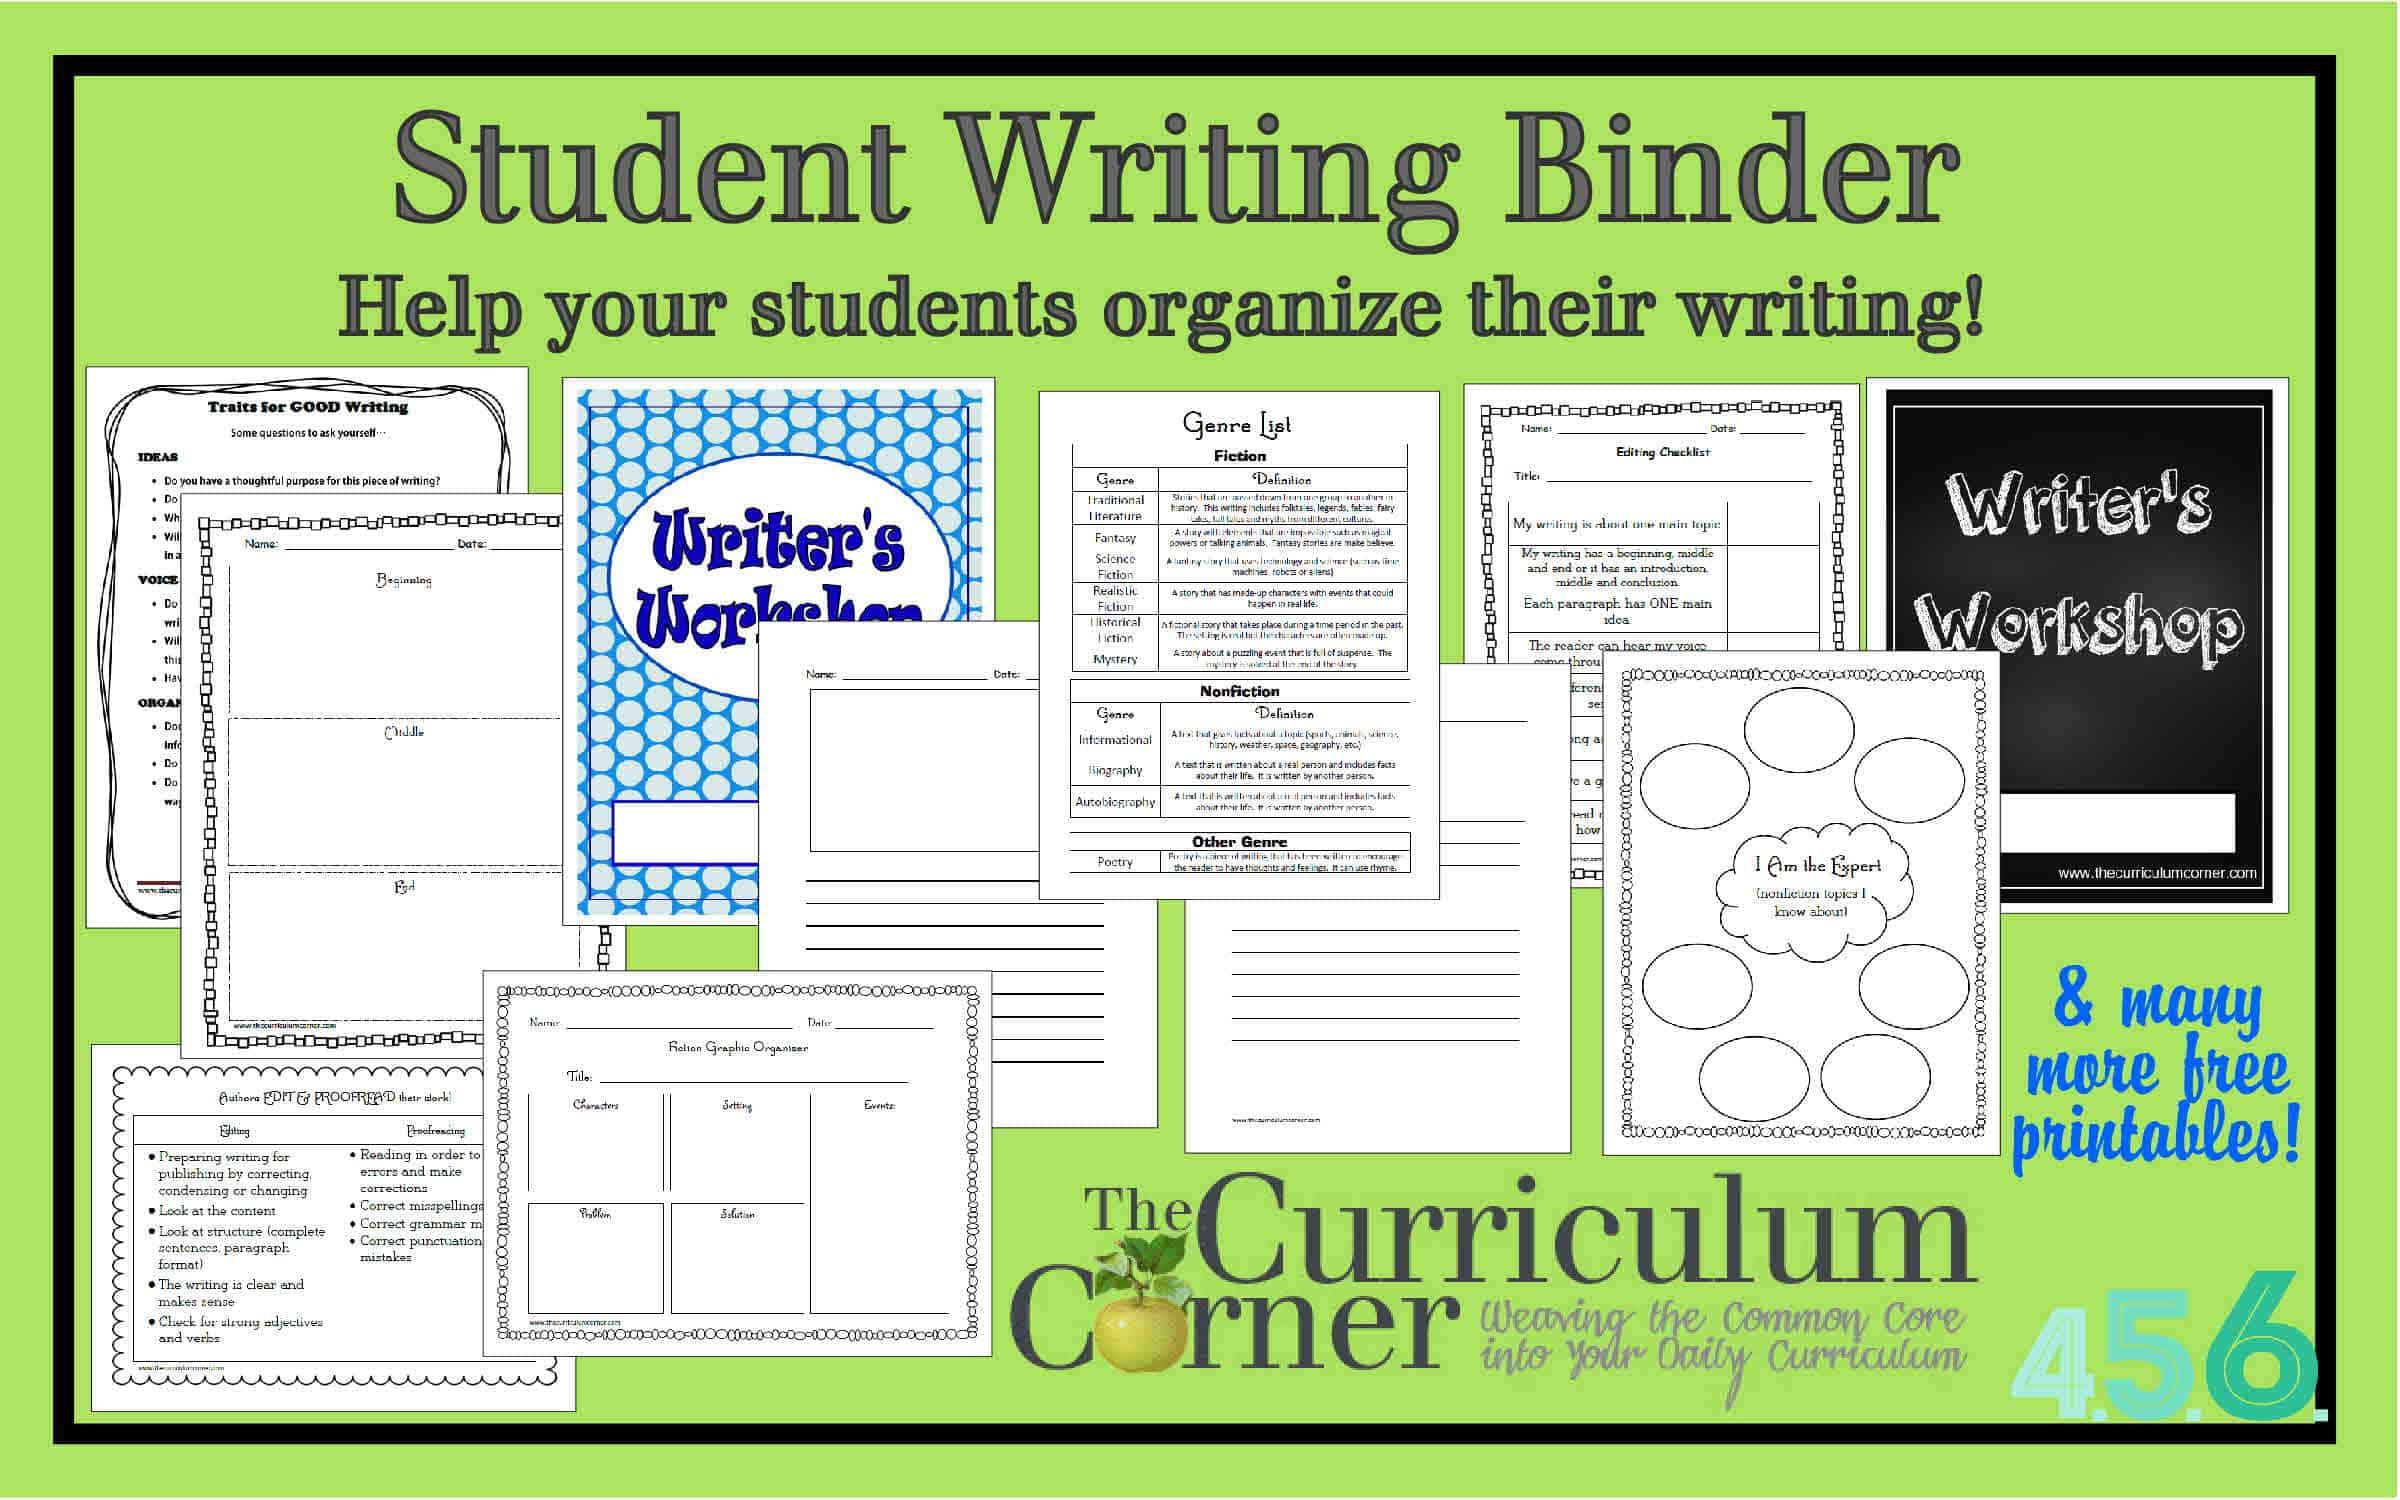 Student Writing Binder